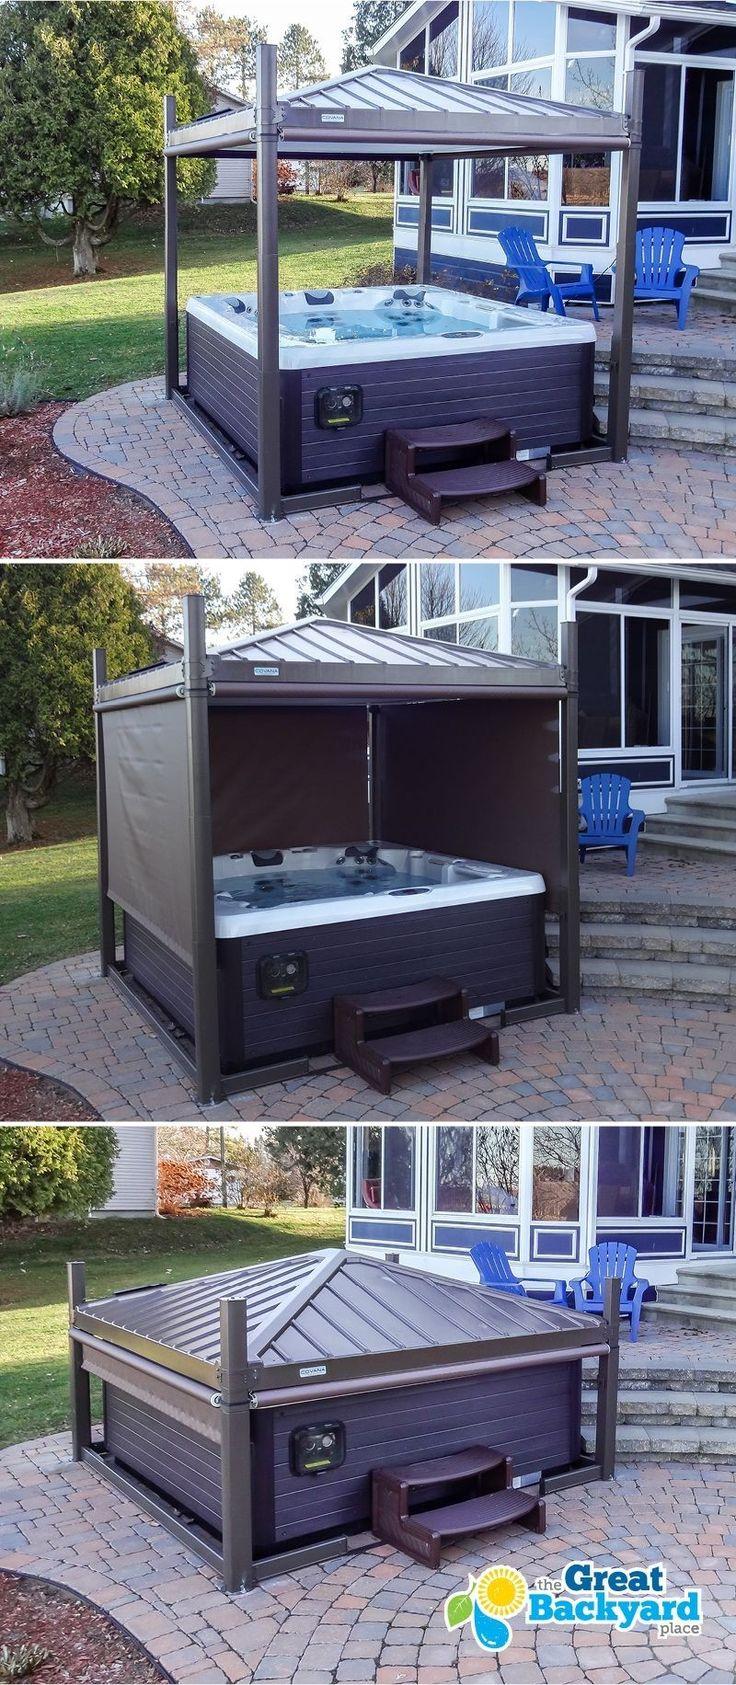 39 best Hot tub ideas images on Pinterest | Outdoor ideas, Backyard ...